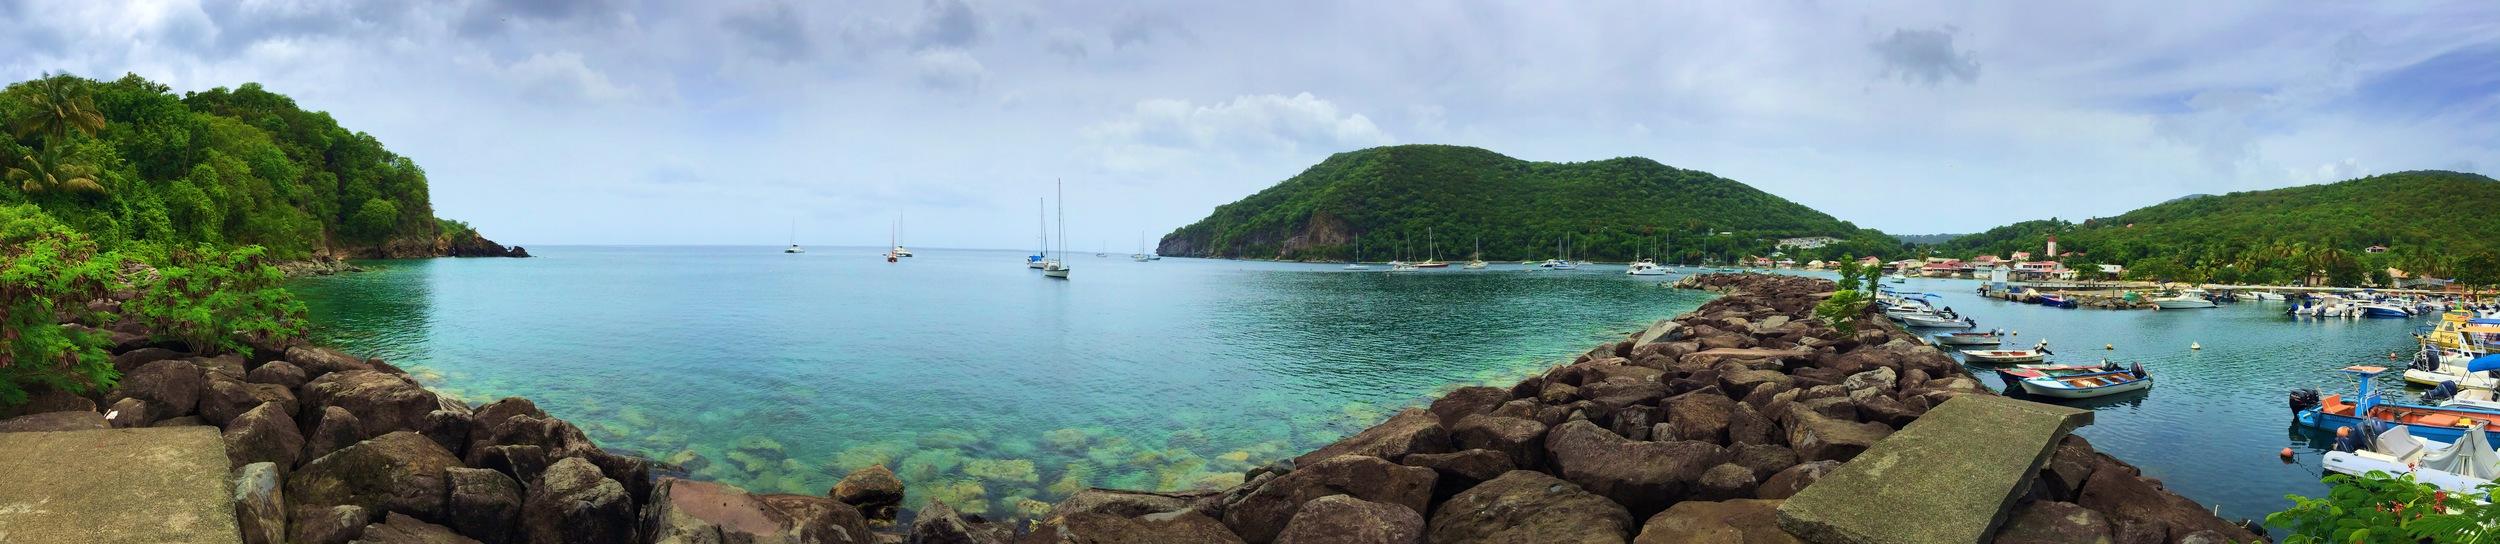 Fishing Village of Deshais, Guadeloupe